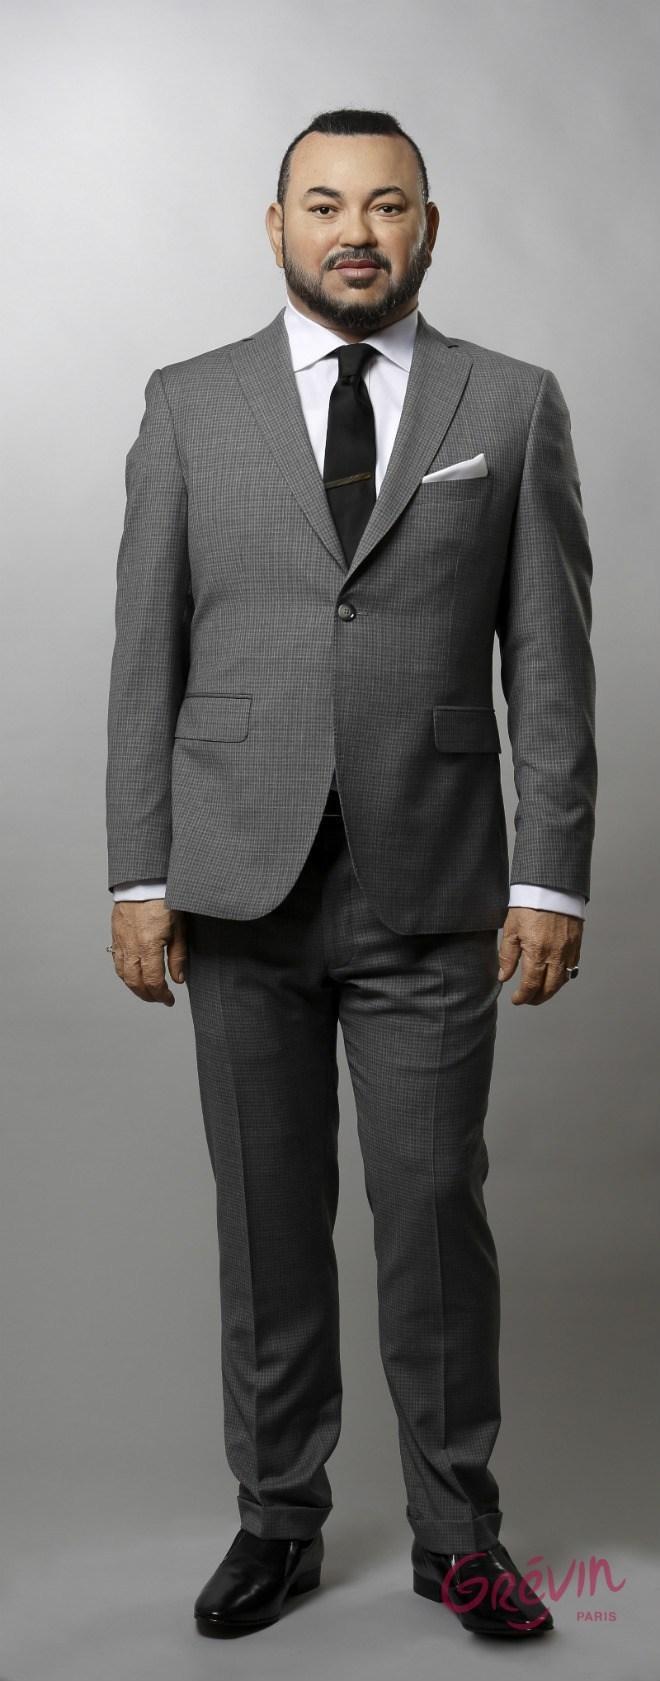 estatua del rey Mohammed VI